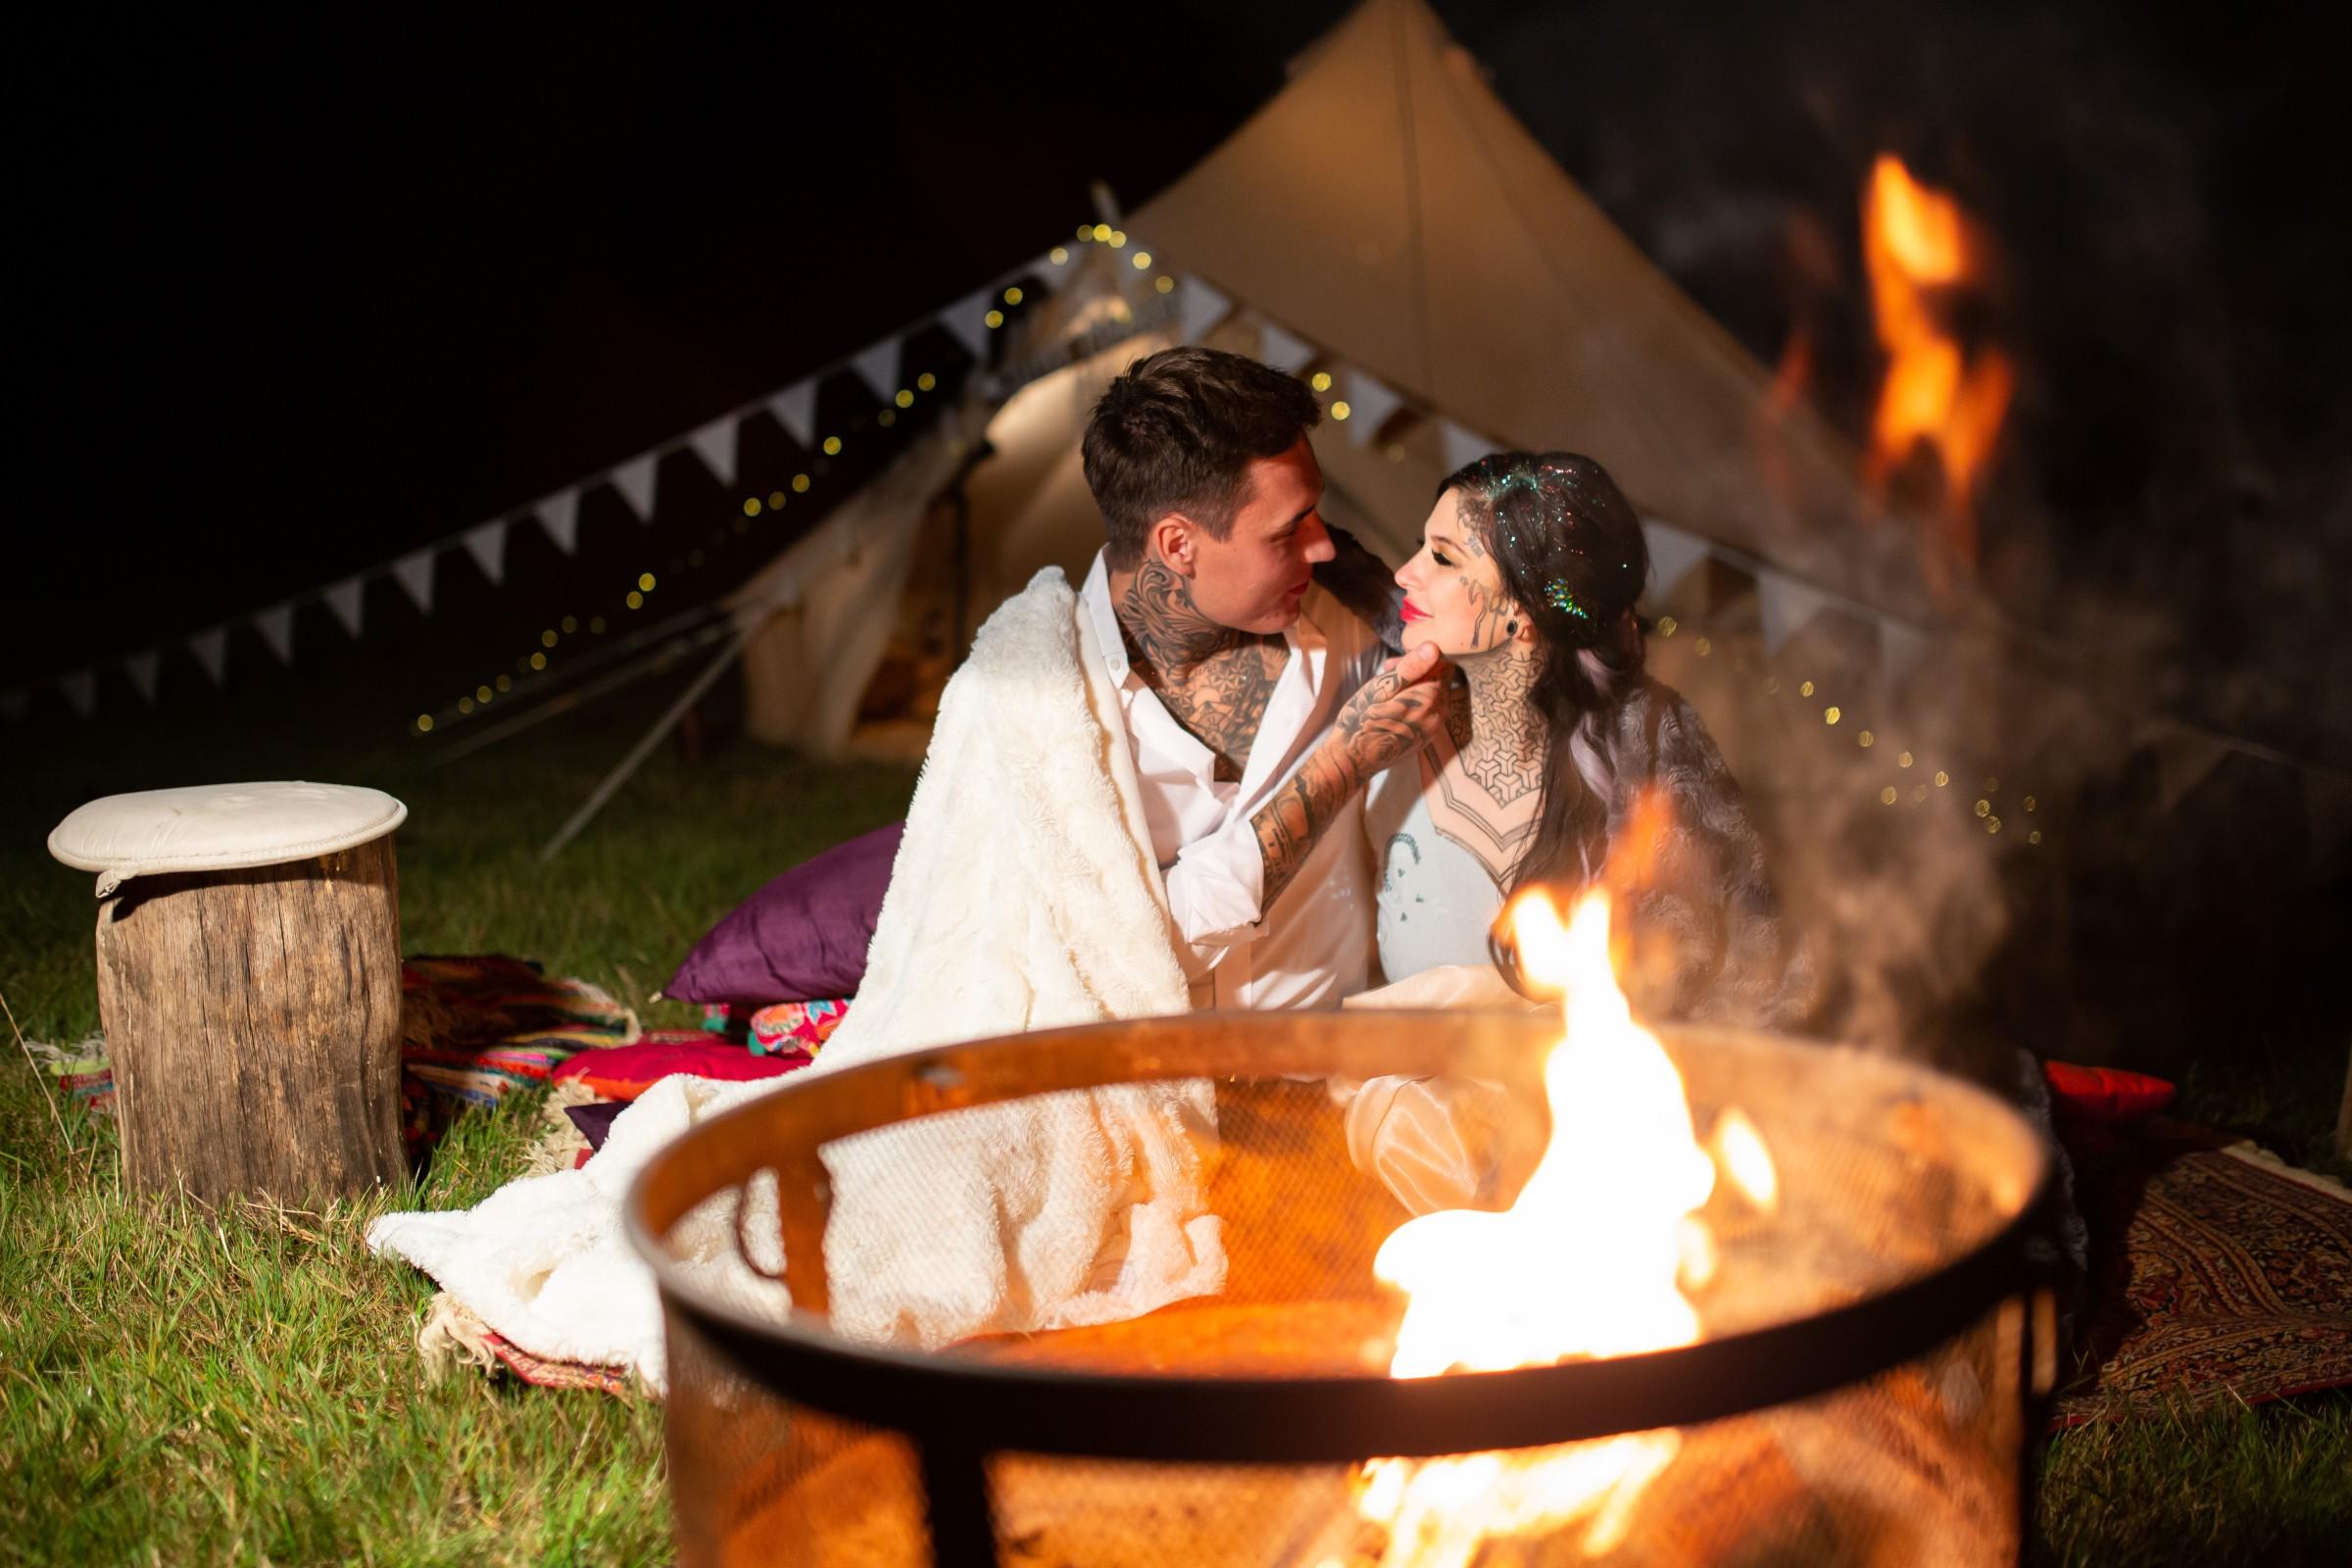 festival wedding - bride and groom at campfire - tipi wedding